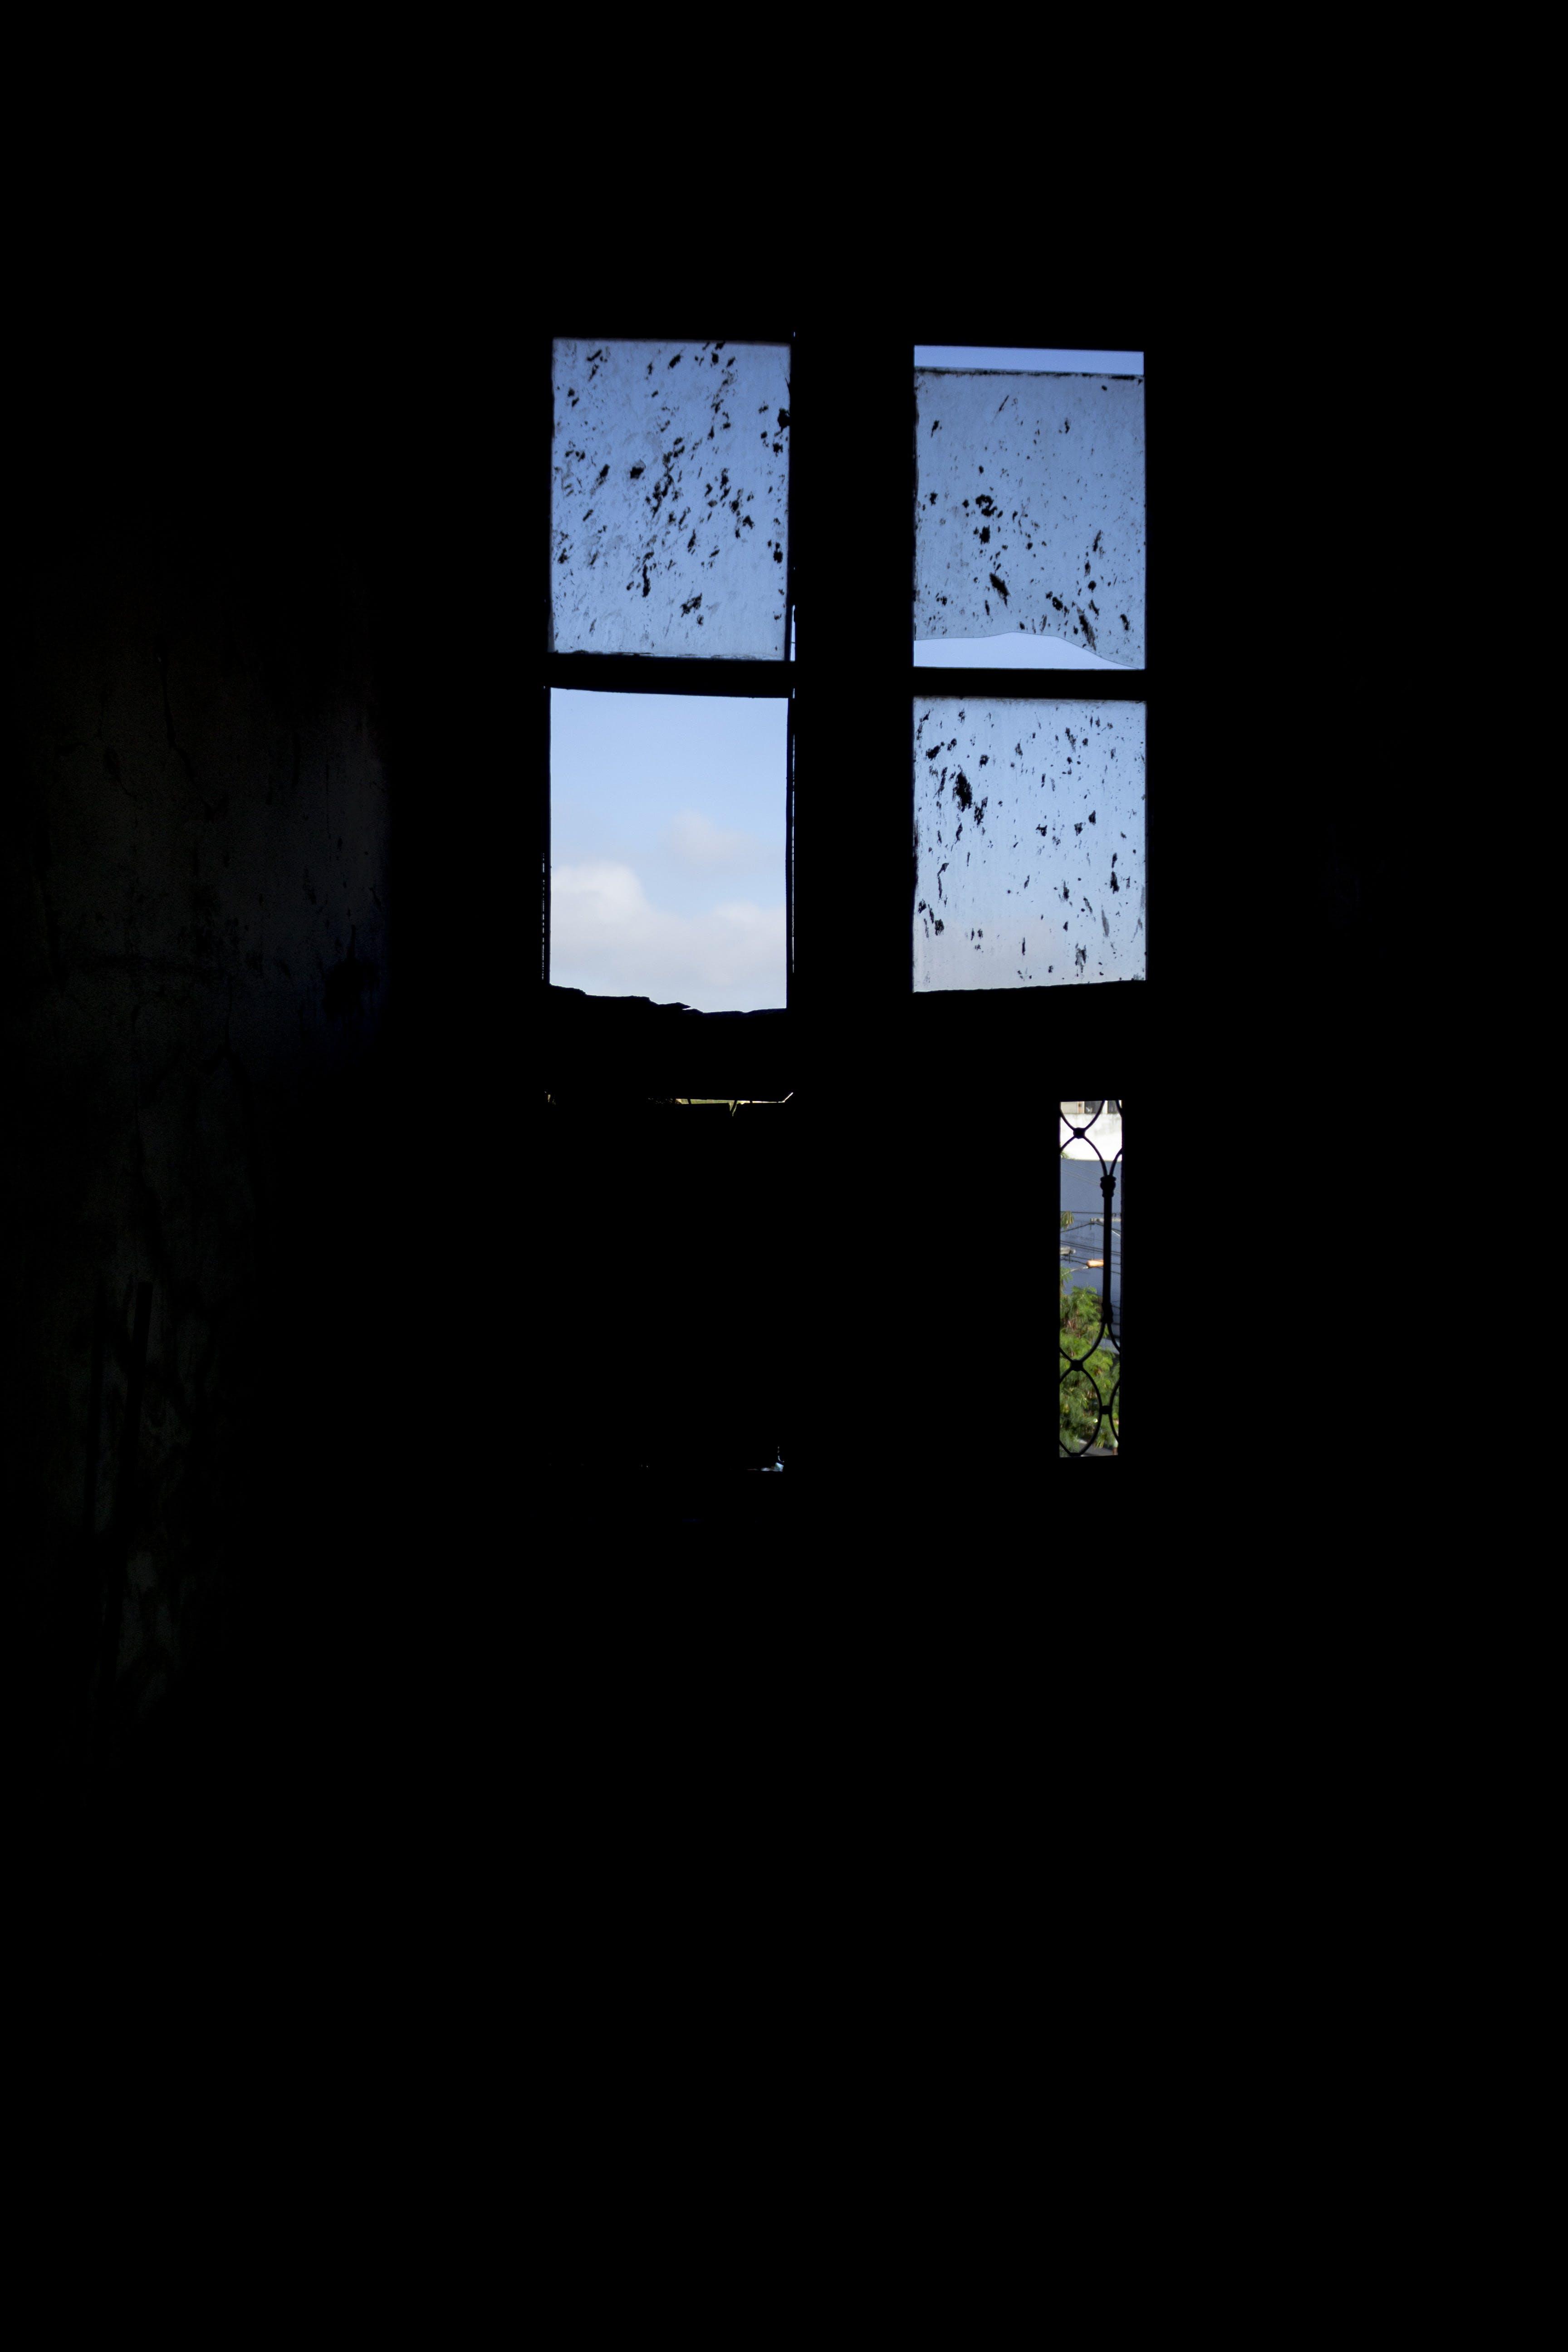 Free stock photo of flight, silhouette, freedom, church window